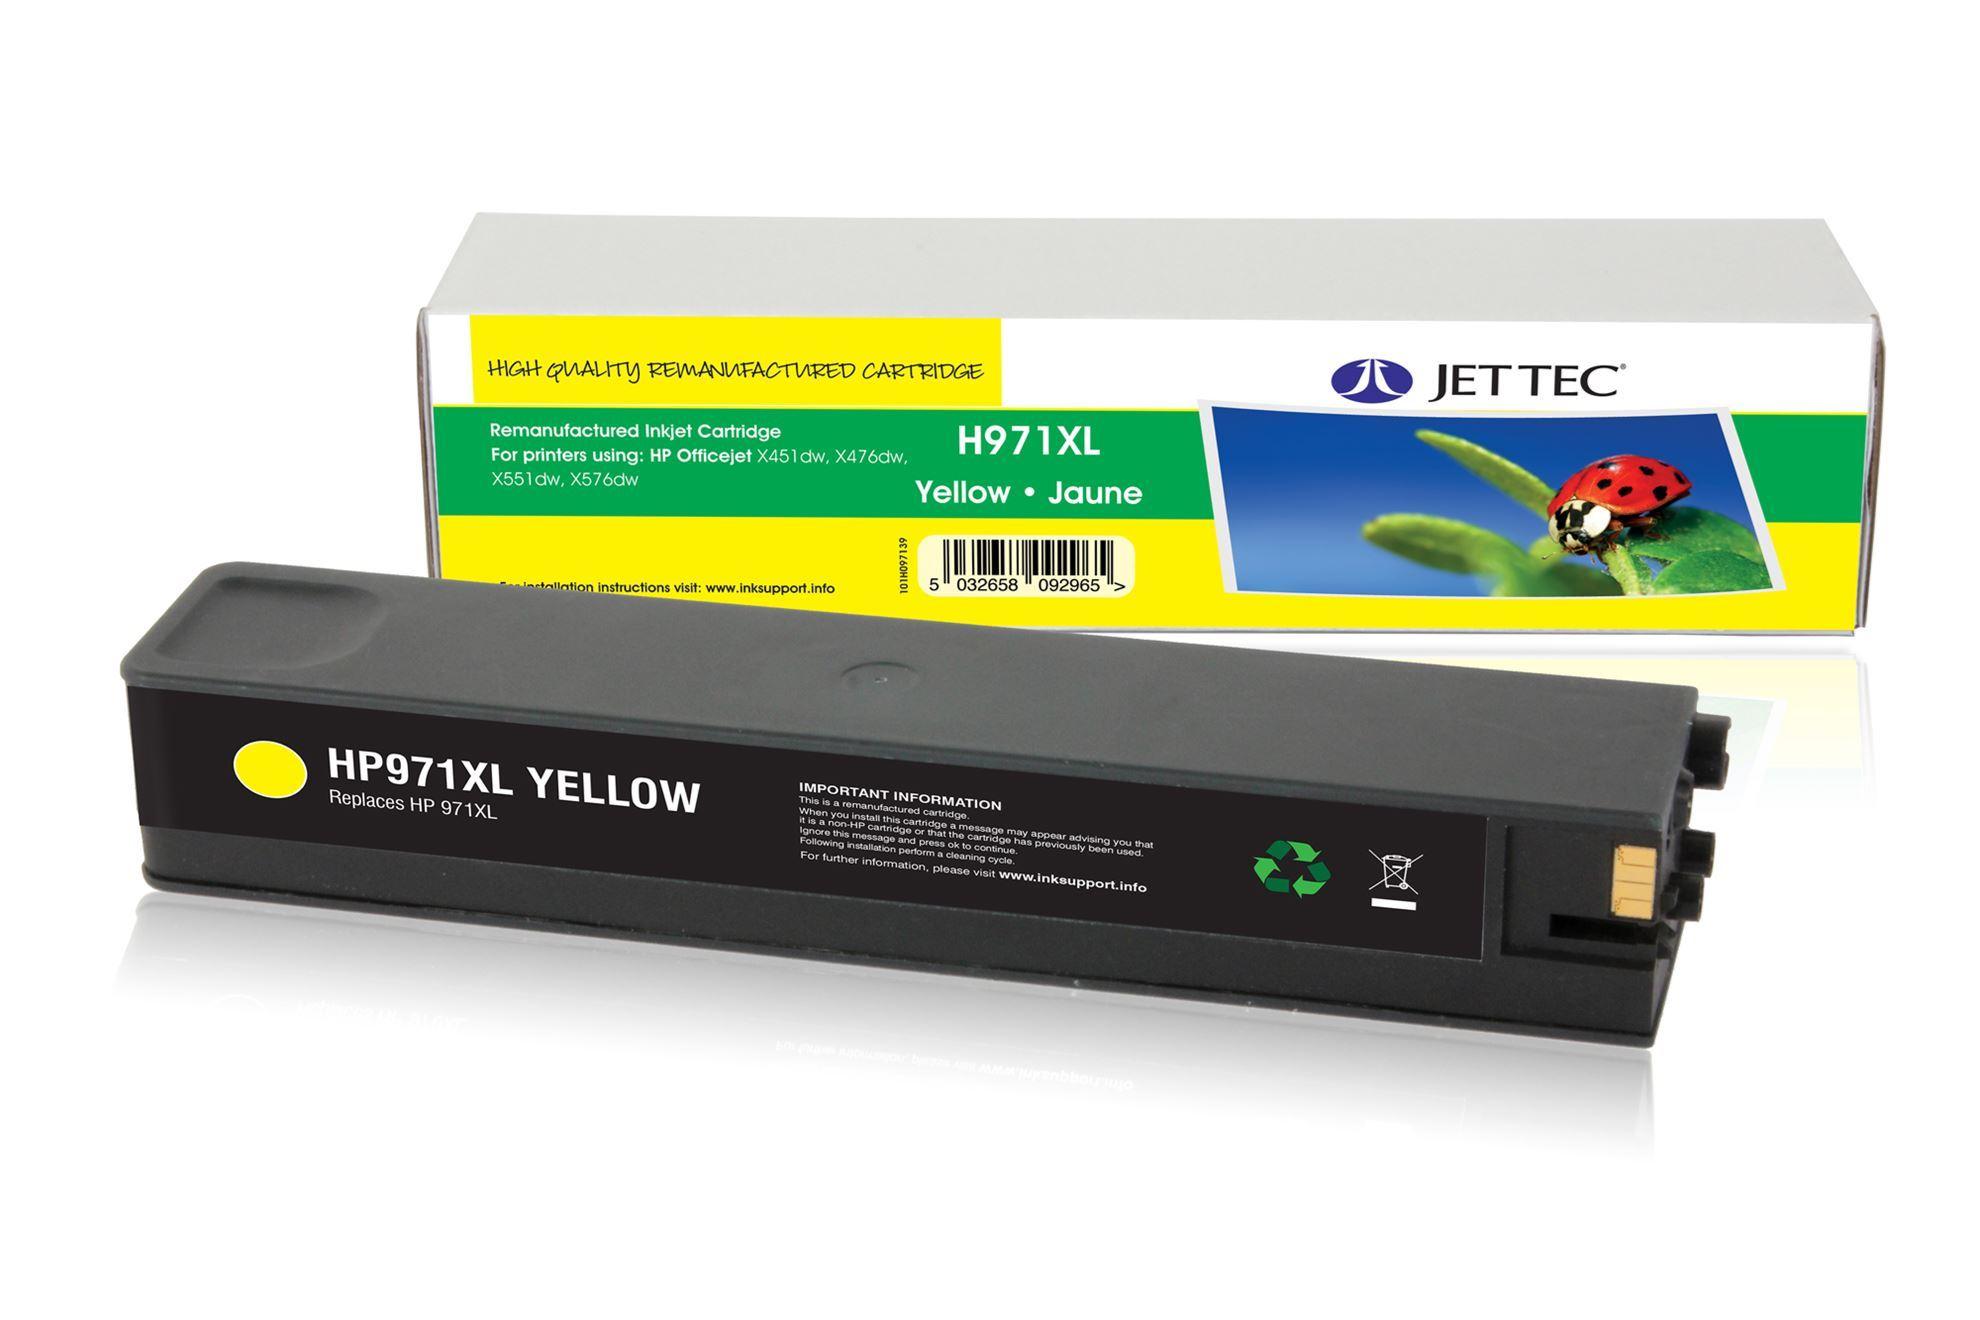 HP971XL Yellow